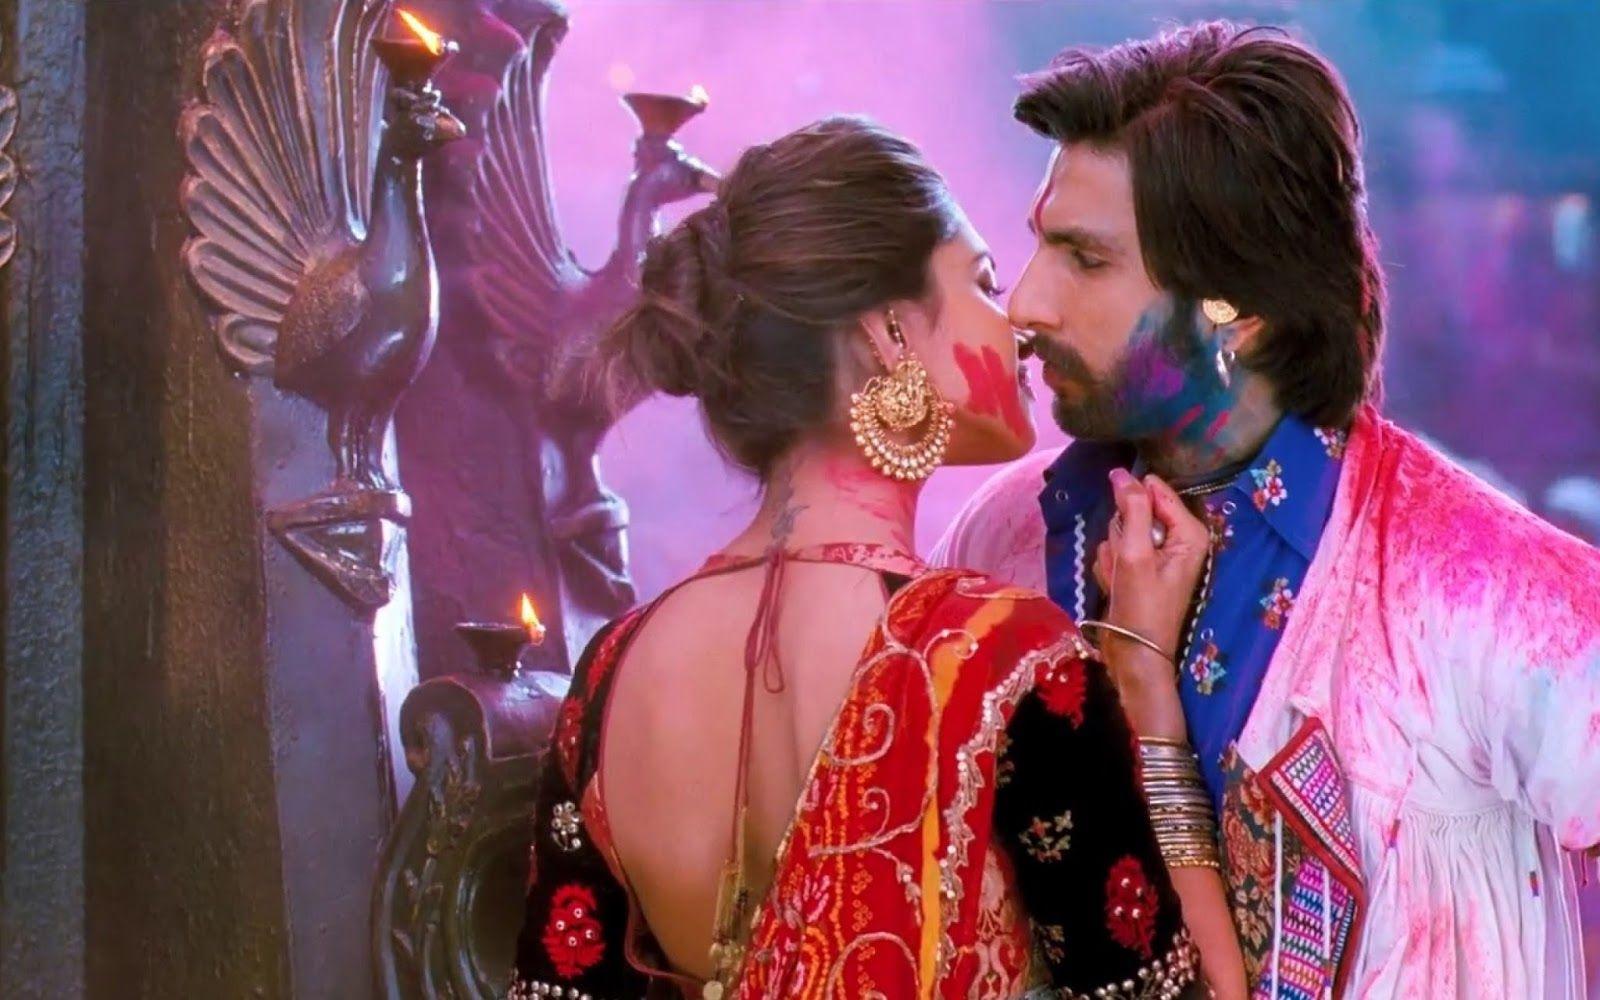 Every One Watch Ramleela Movie Number Of Times Because Of The This Couple Deepika Padukone Ranveer Singh Kissing S Deepika Padukone Ranveer Singh Leela Movie